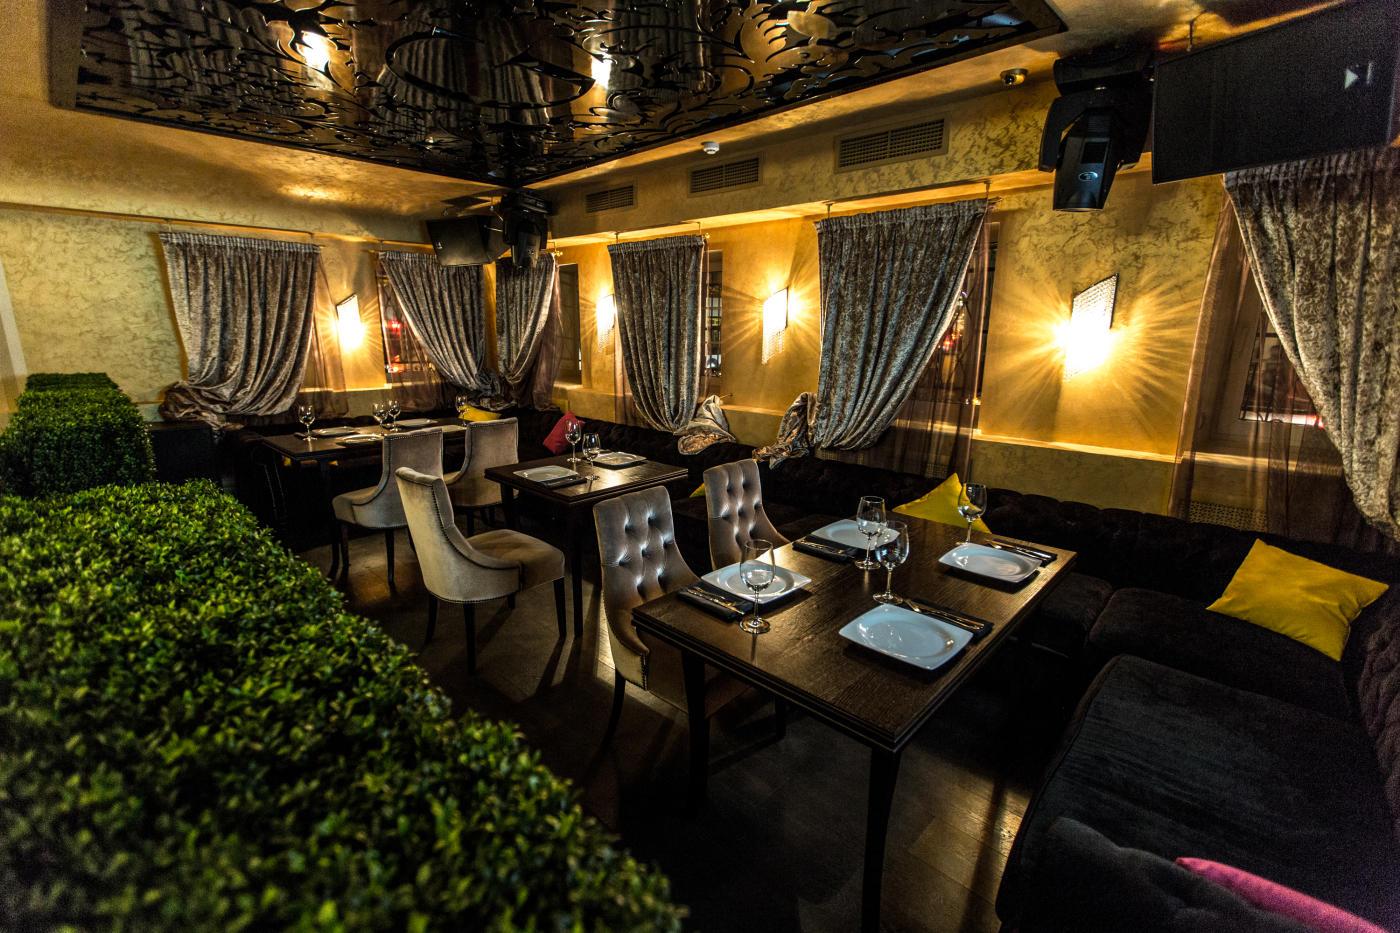 Ресторан Graff Lounge (Граф Лаунж) фото 1